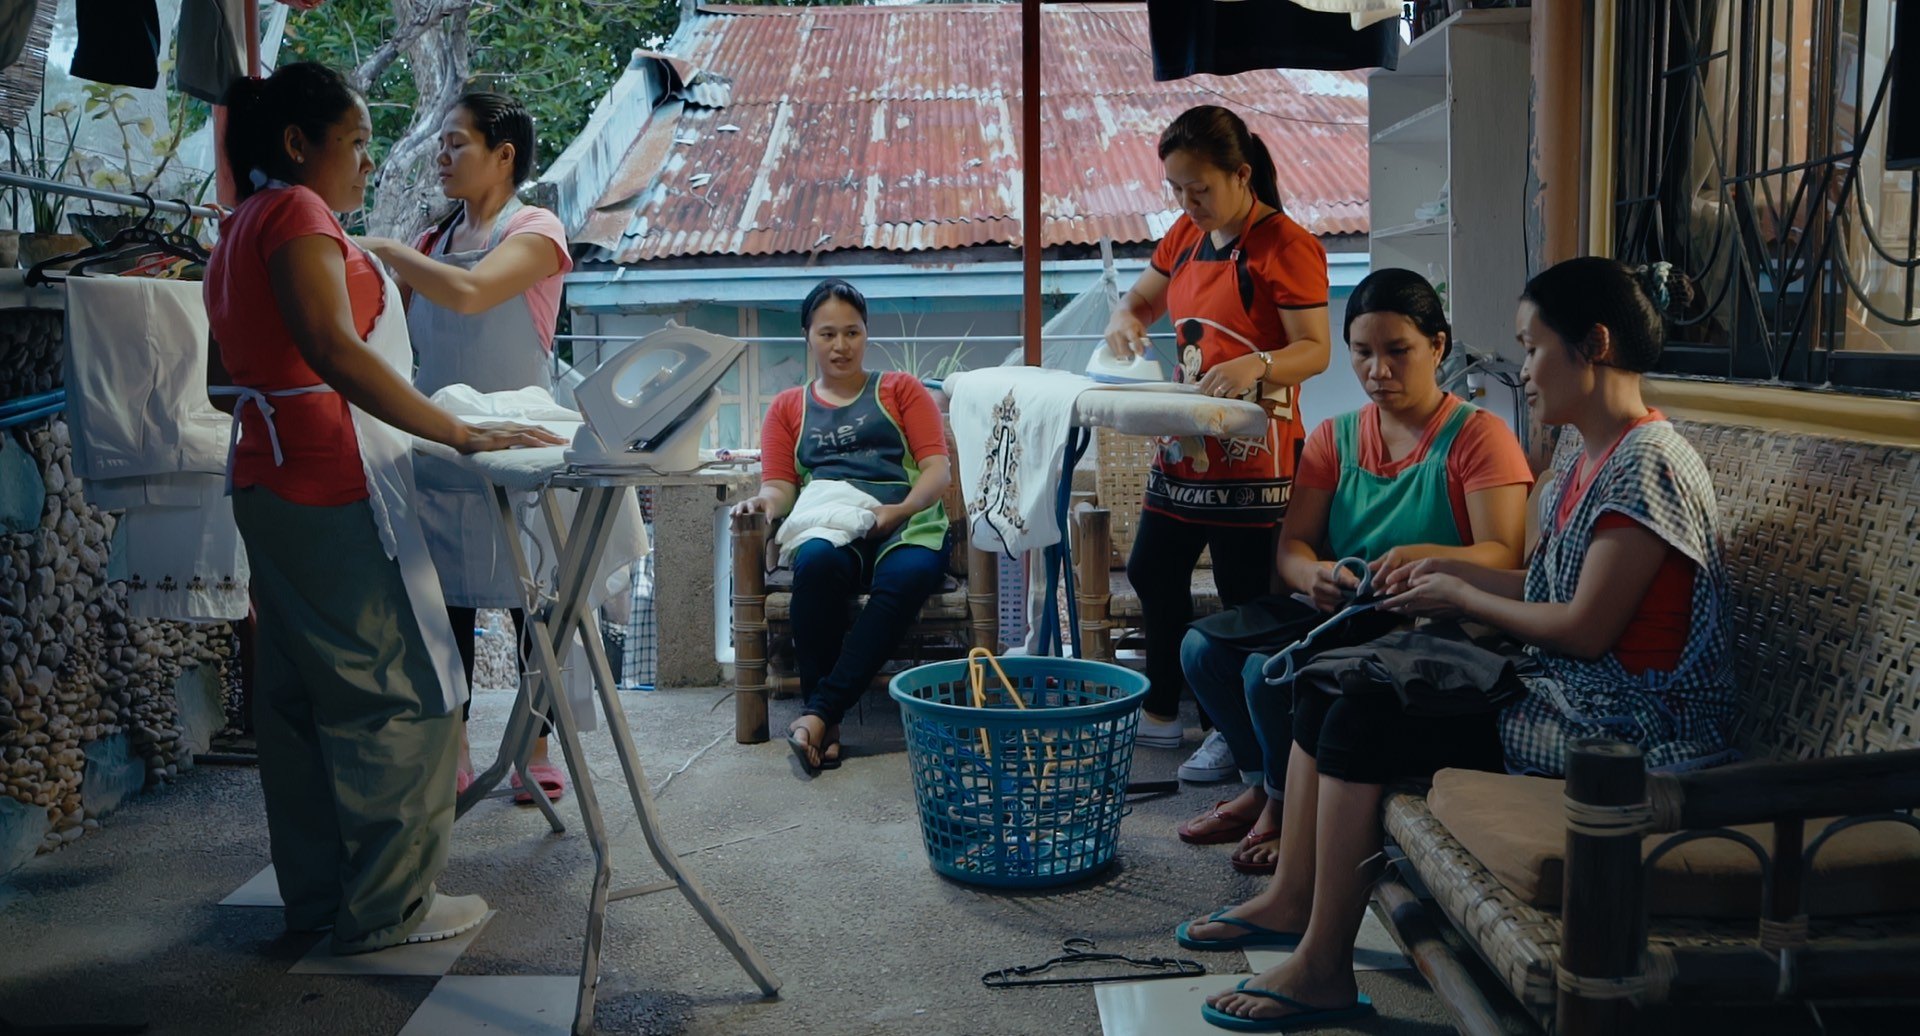 Les filipines no som dèbils